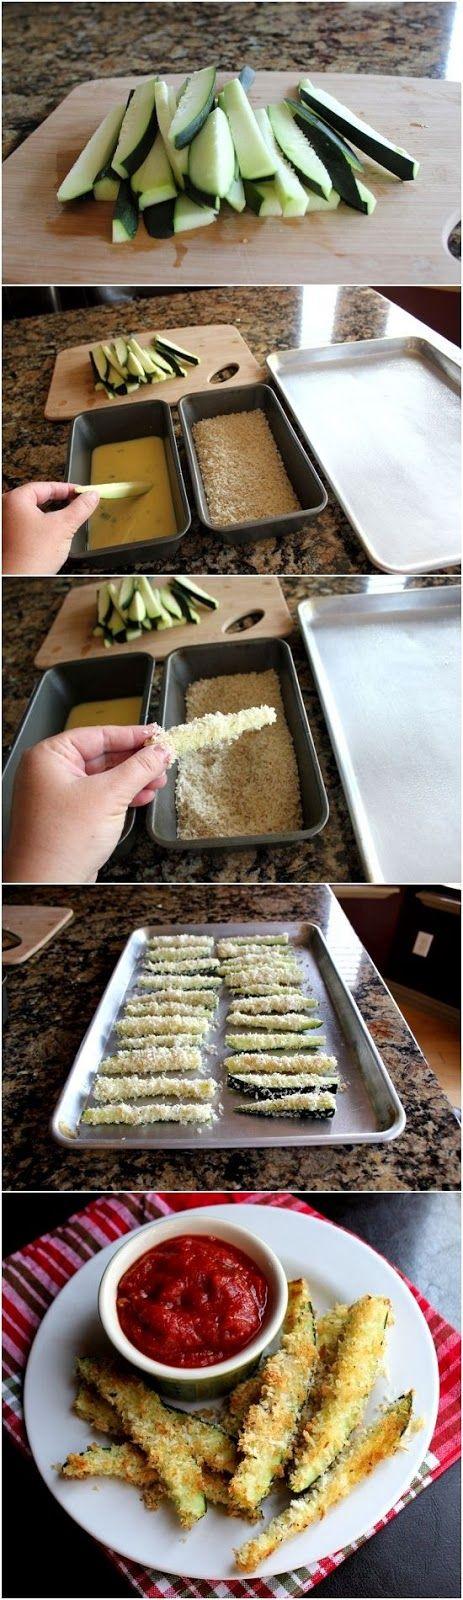 Photo Place: Crispy Baked Zucchini Fries